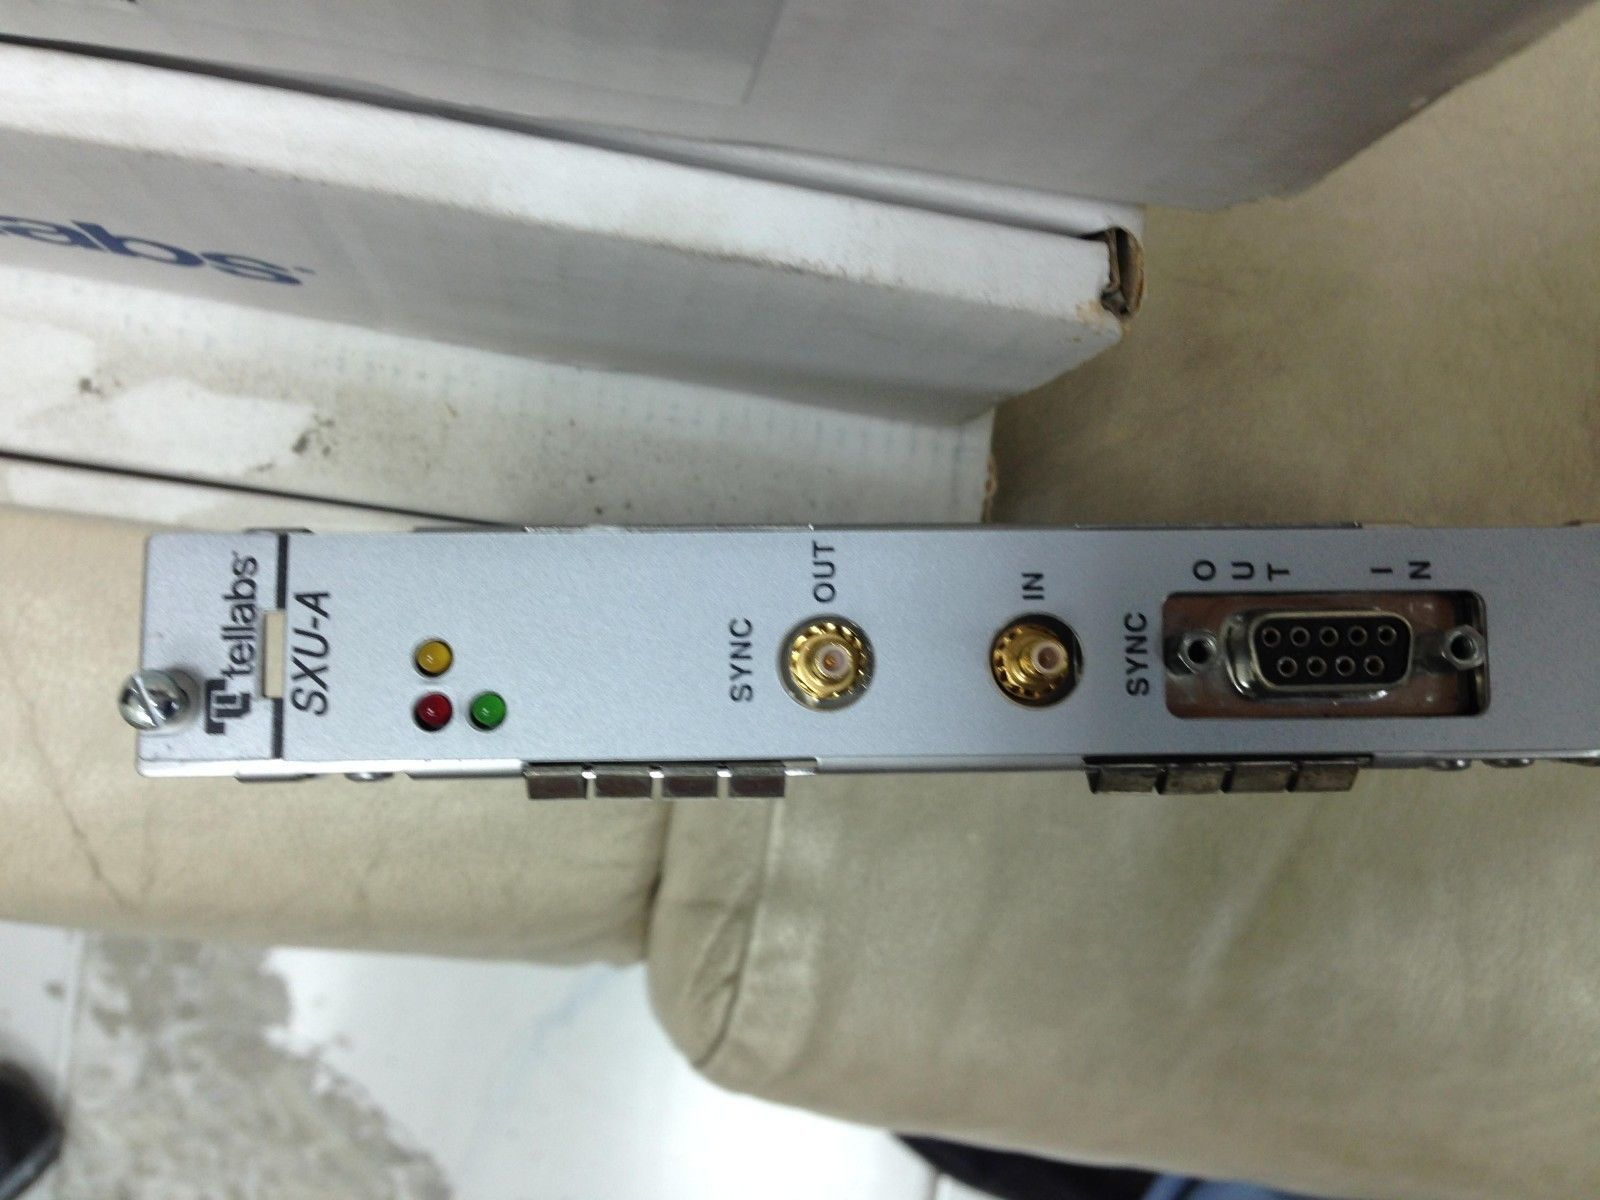 Tellabs-interface-module-PUT-5T-sxu-a212_3